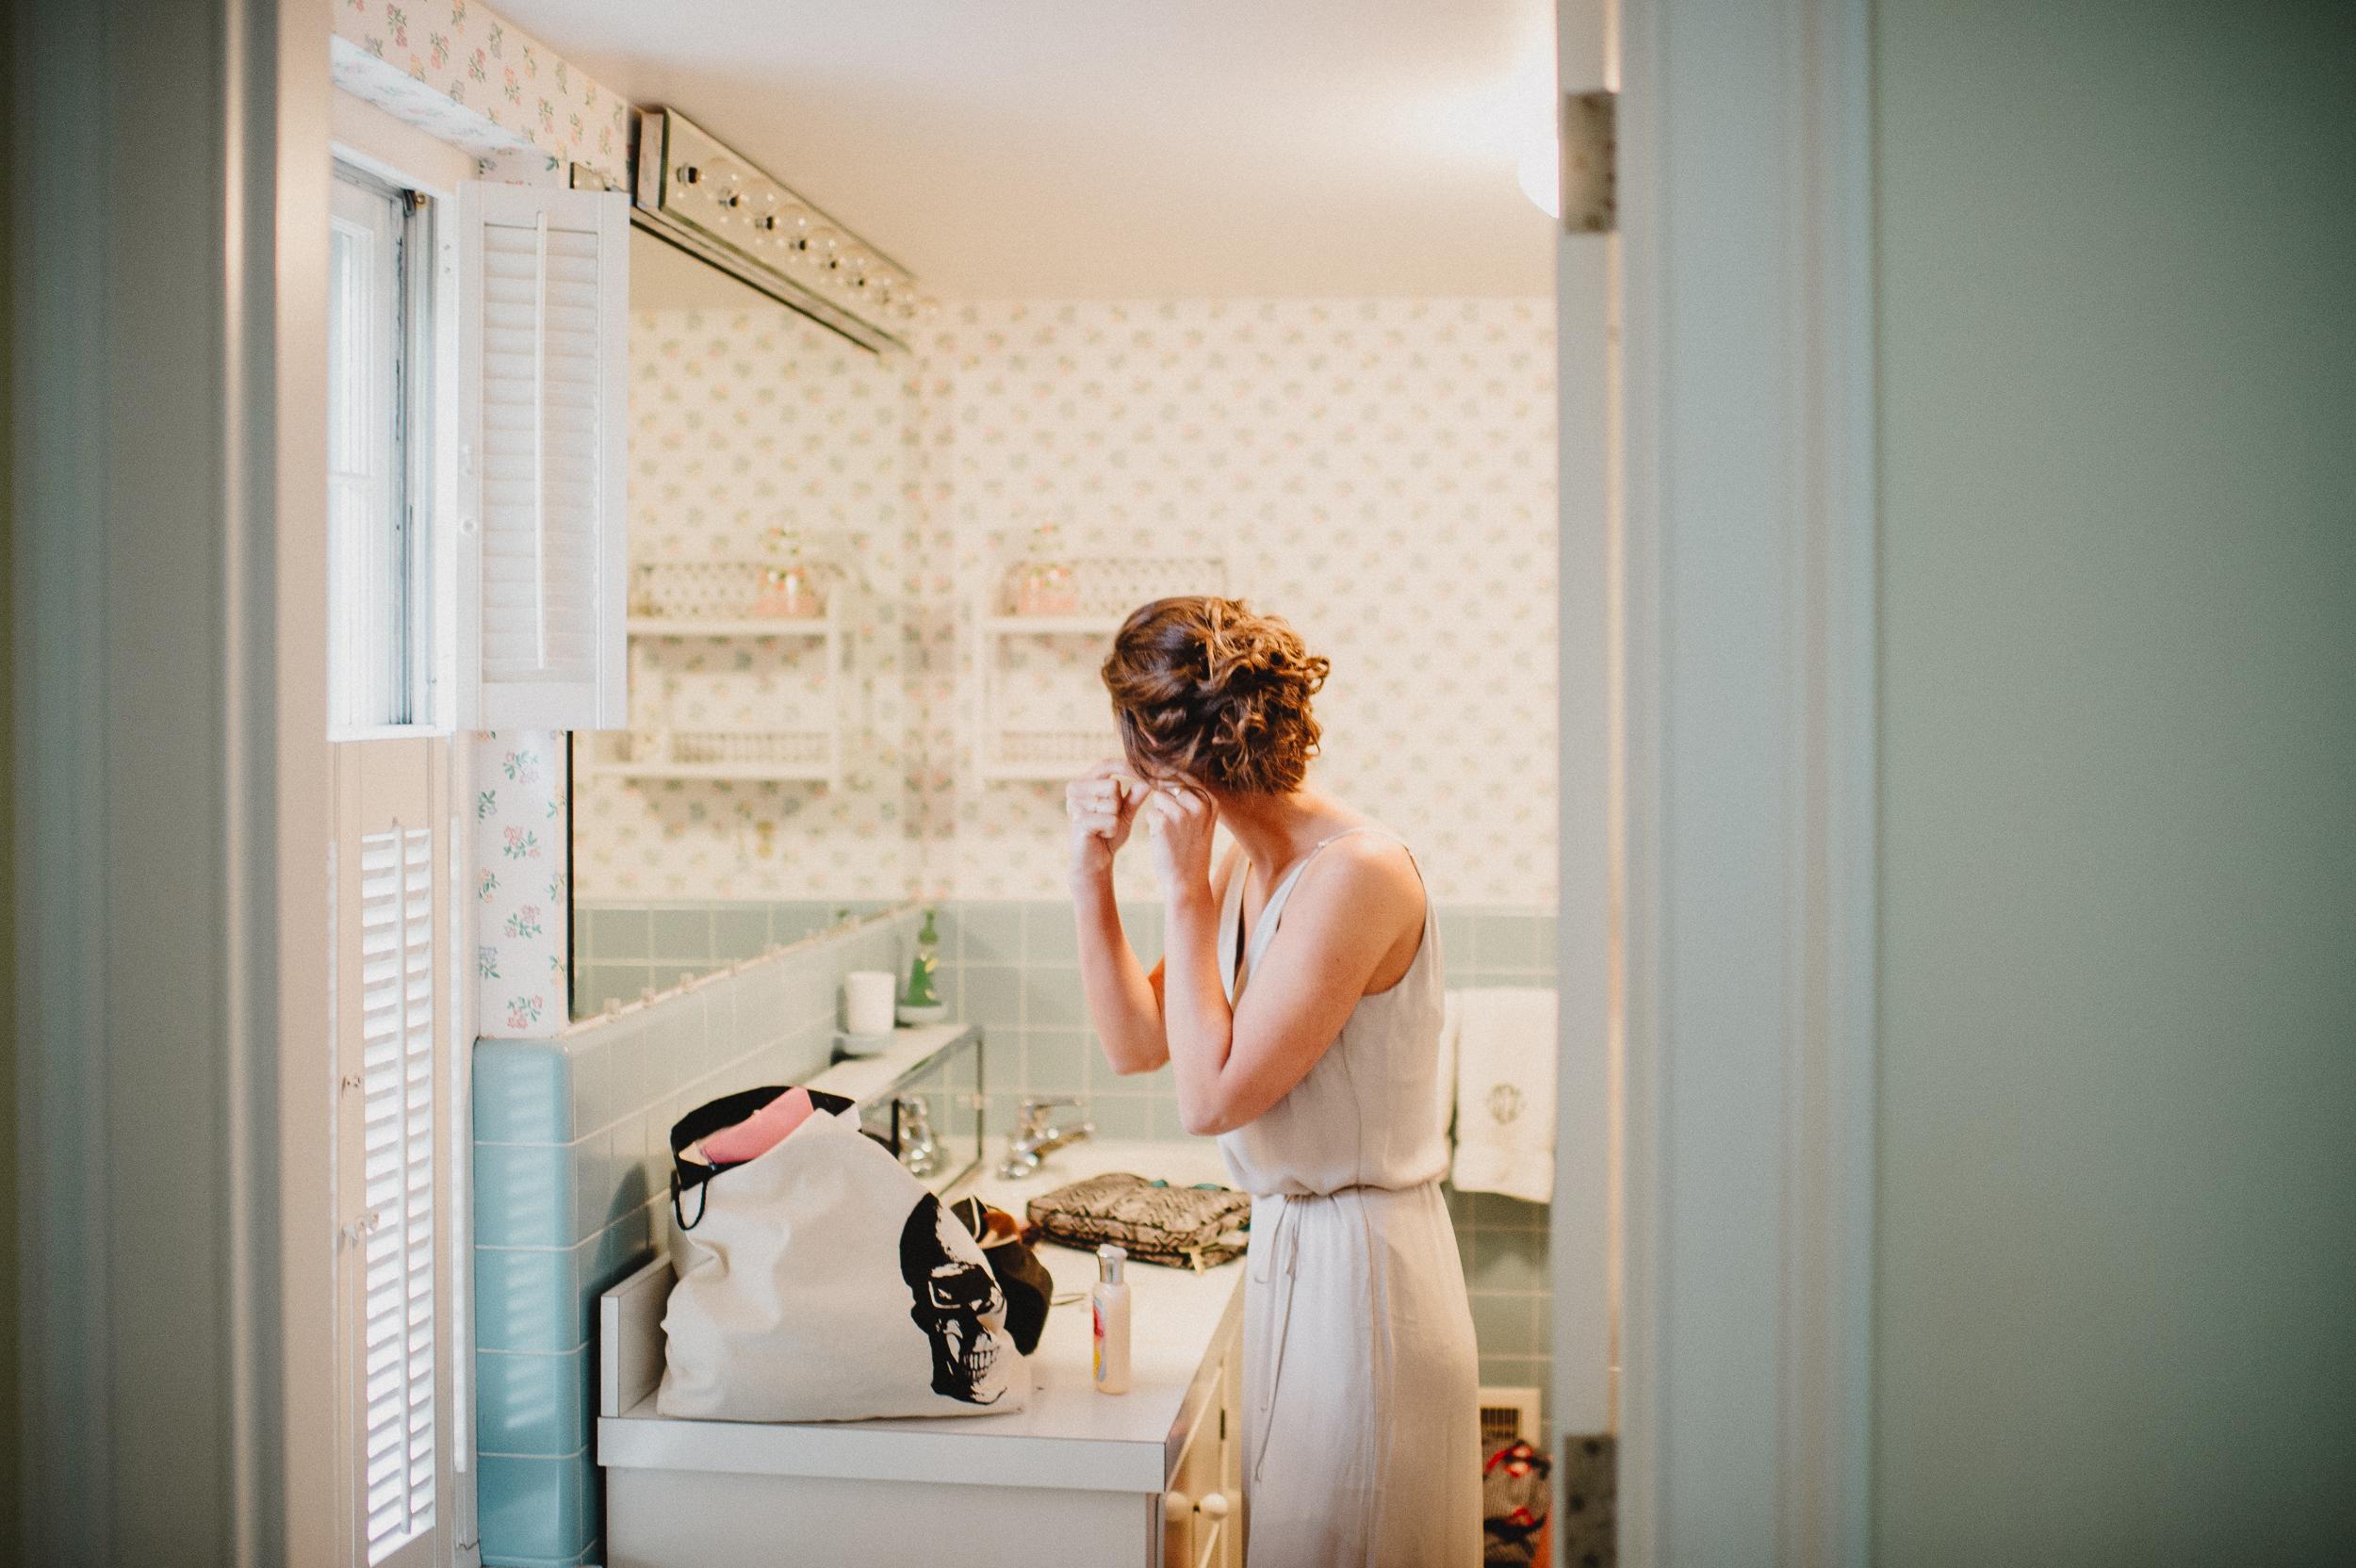 delaware-estate-wedding-photographer-pat-robinson-photography-17.jpg